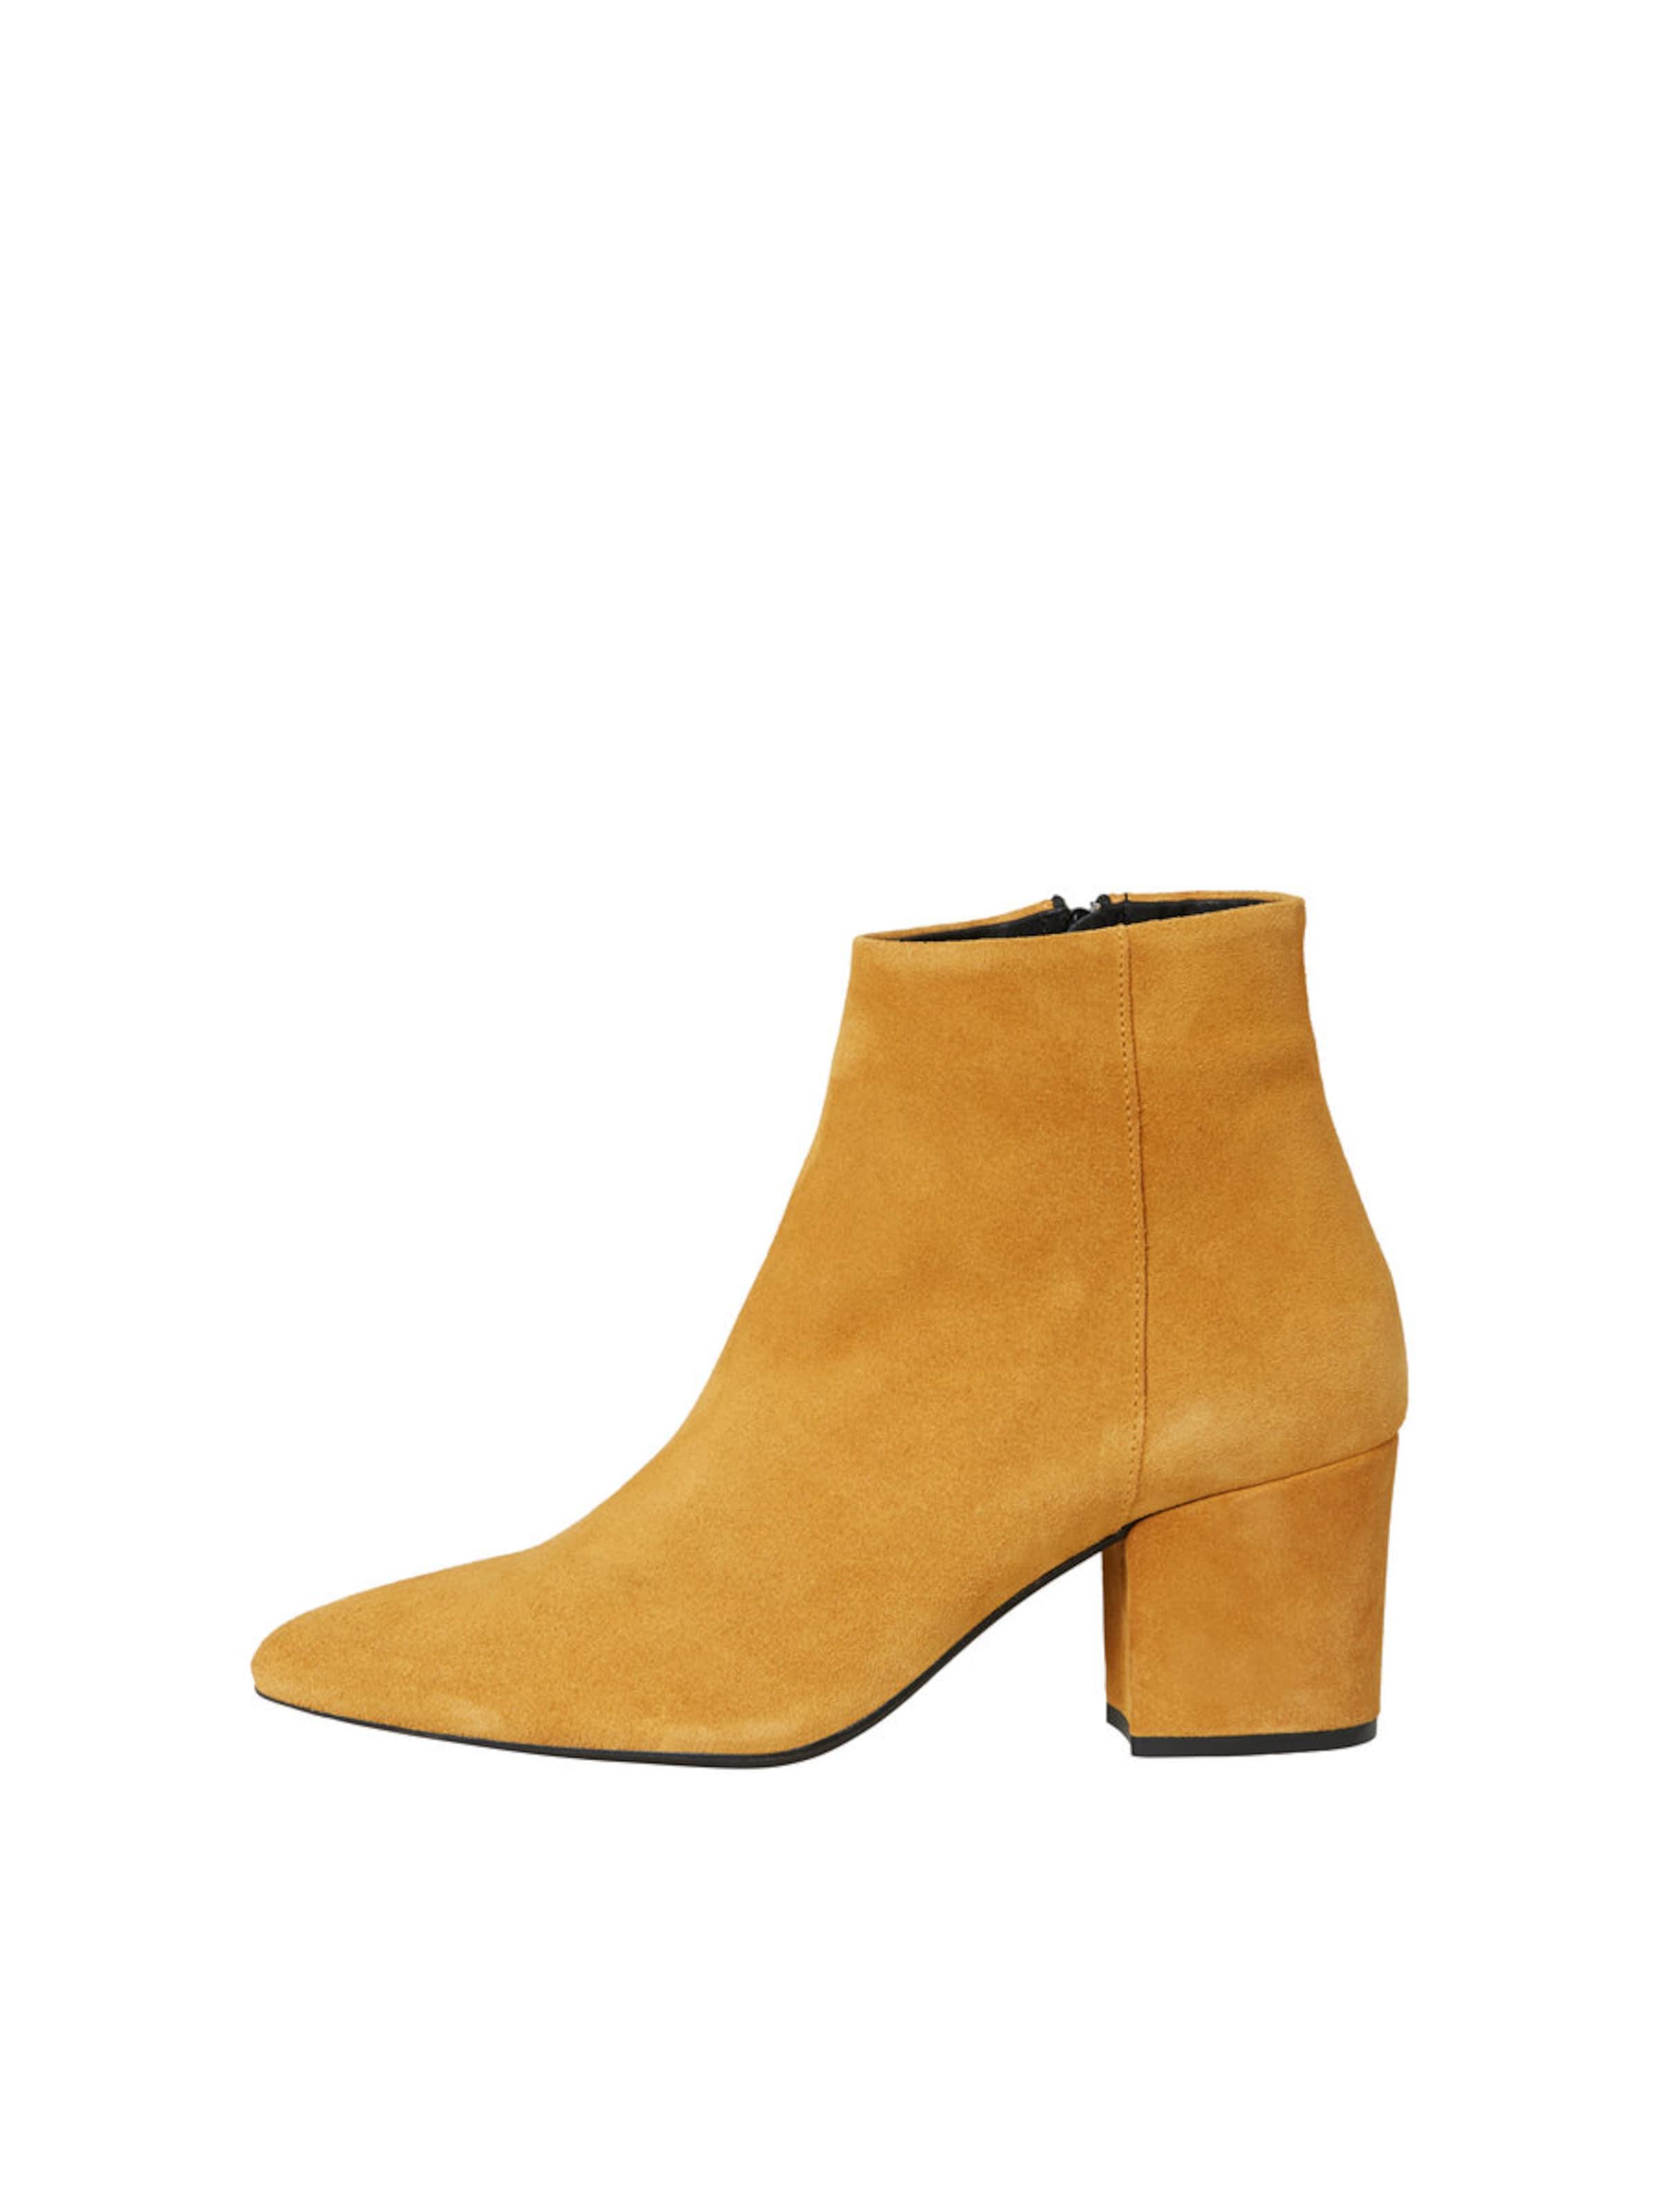 Haltbare Mode billige Schuhe VERO MODA | Ankle Boots Schuhe Gut getragene Schuhe